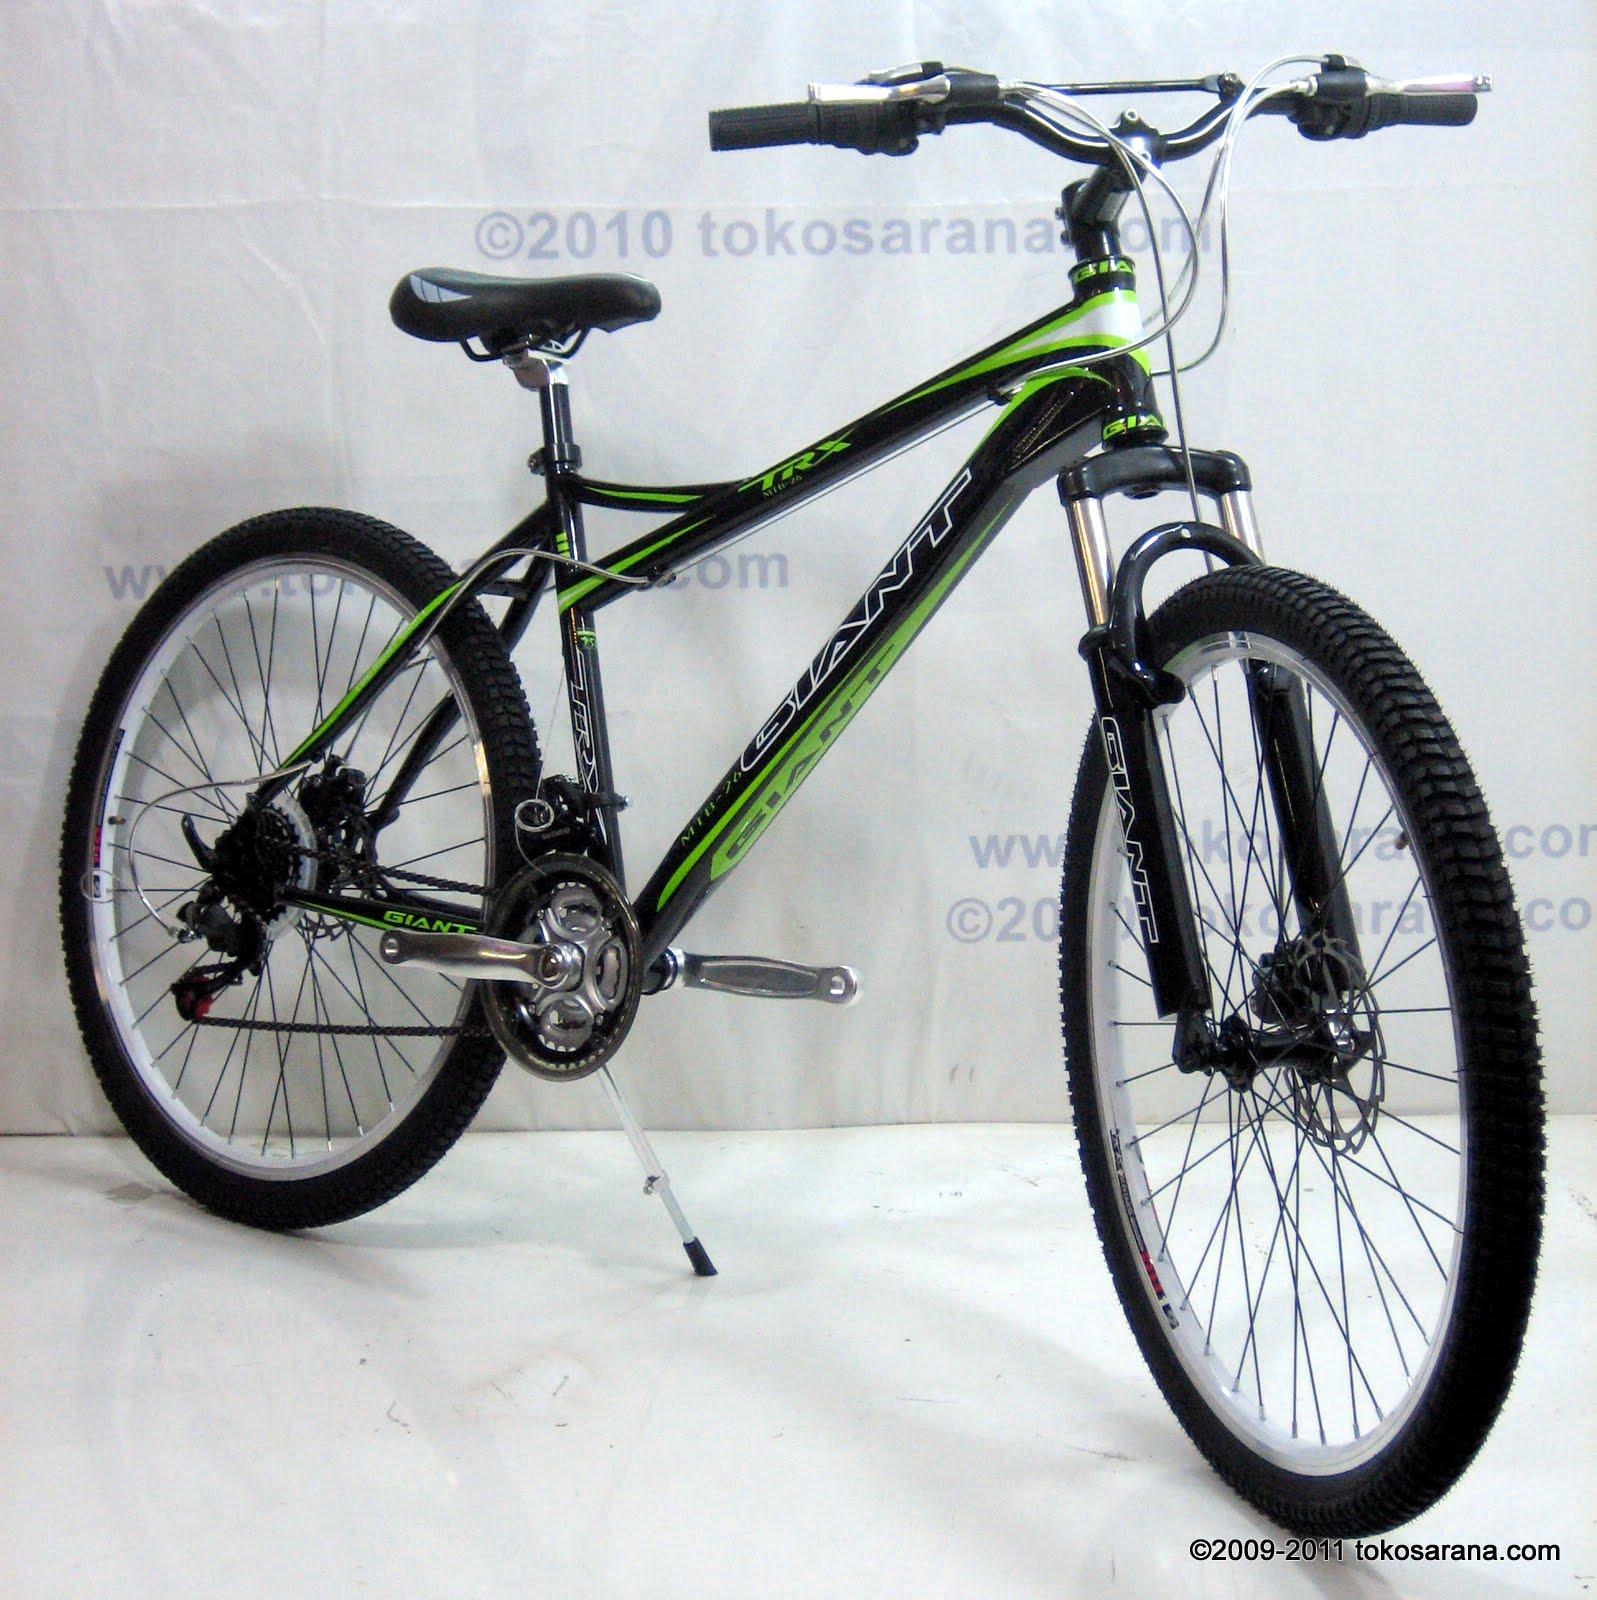 tokosarana™ Mahasarana Sukses™ Sepeda Gunung Giant TRX